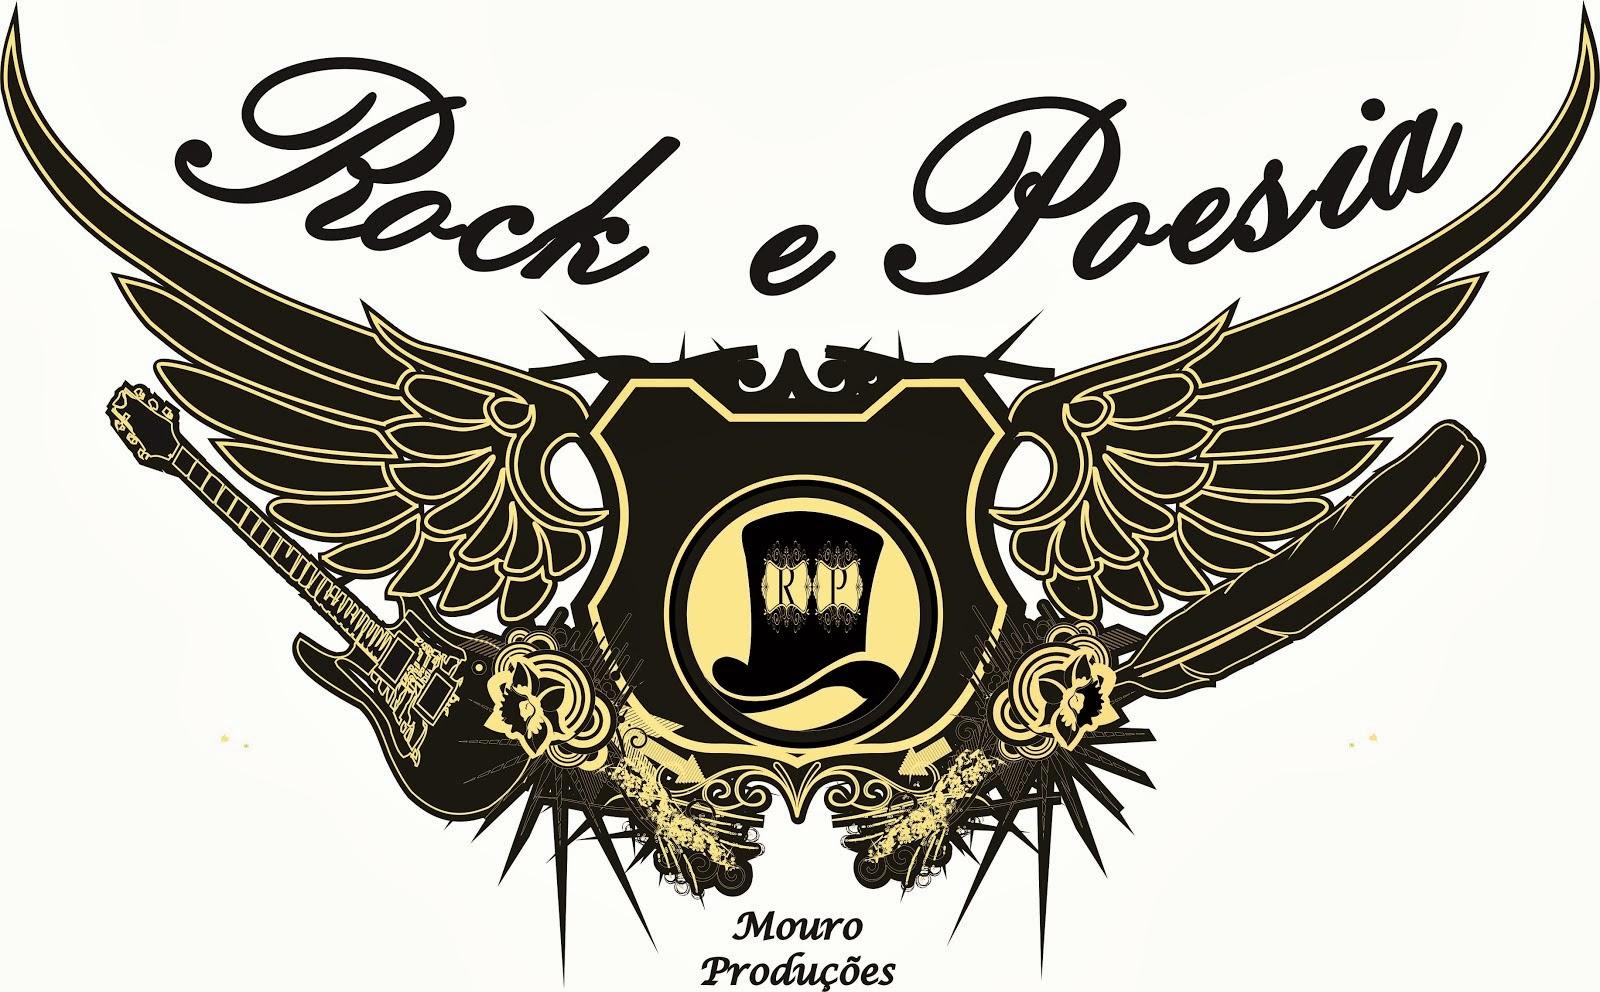 Nova logo marca